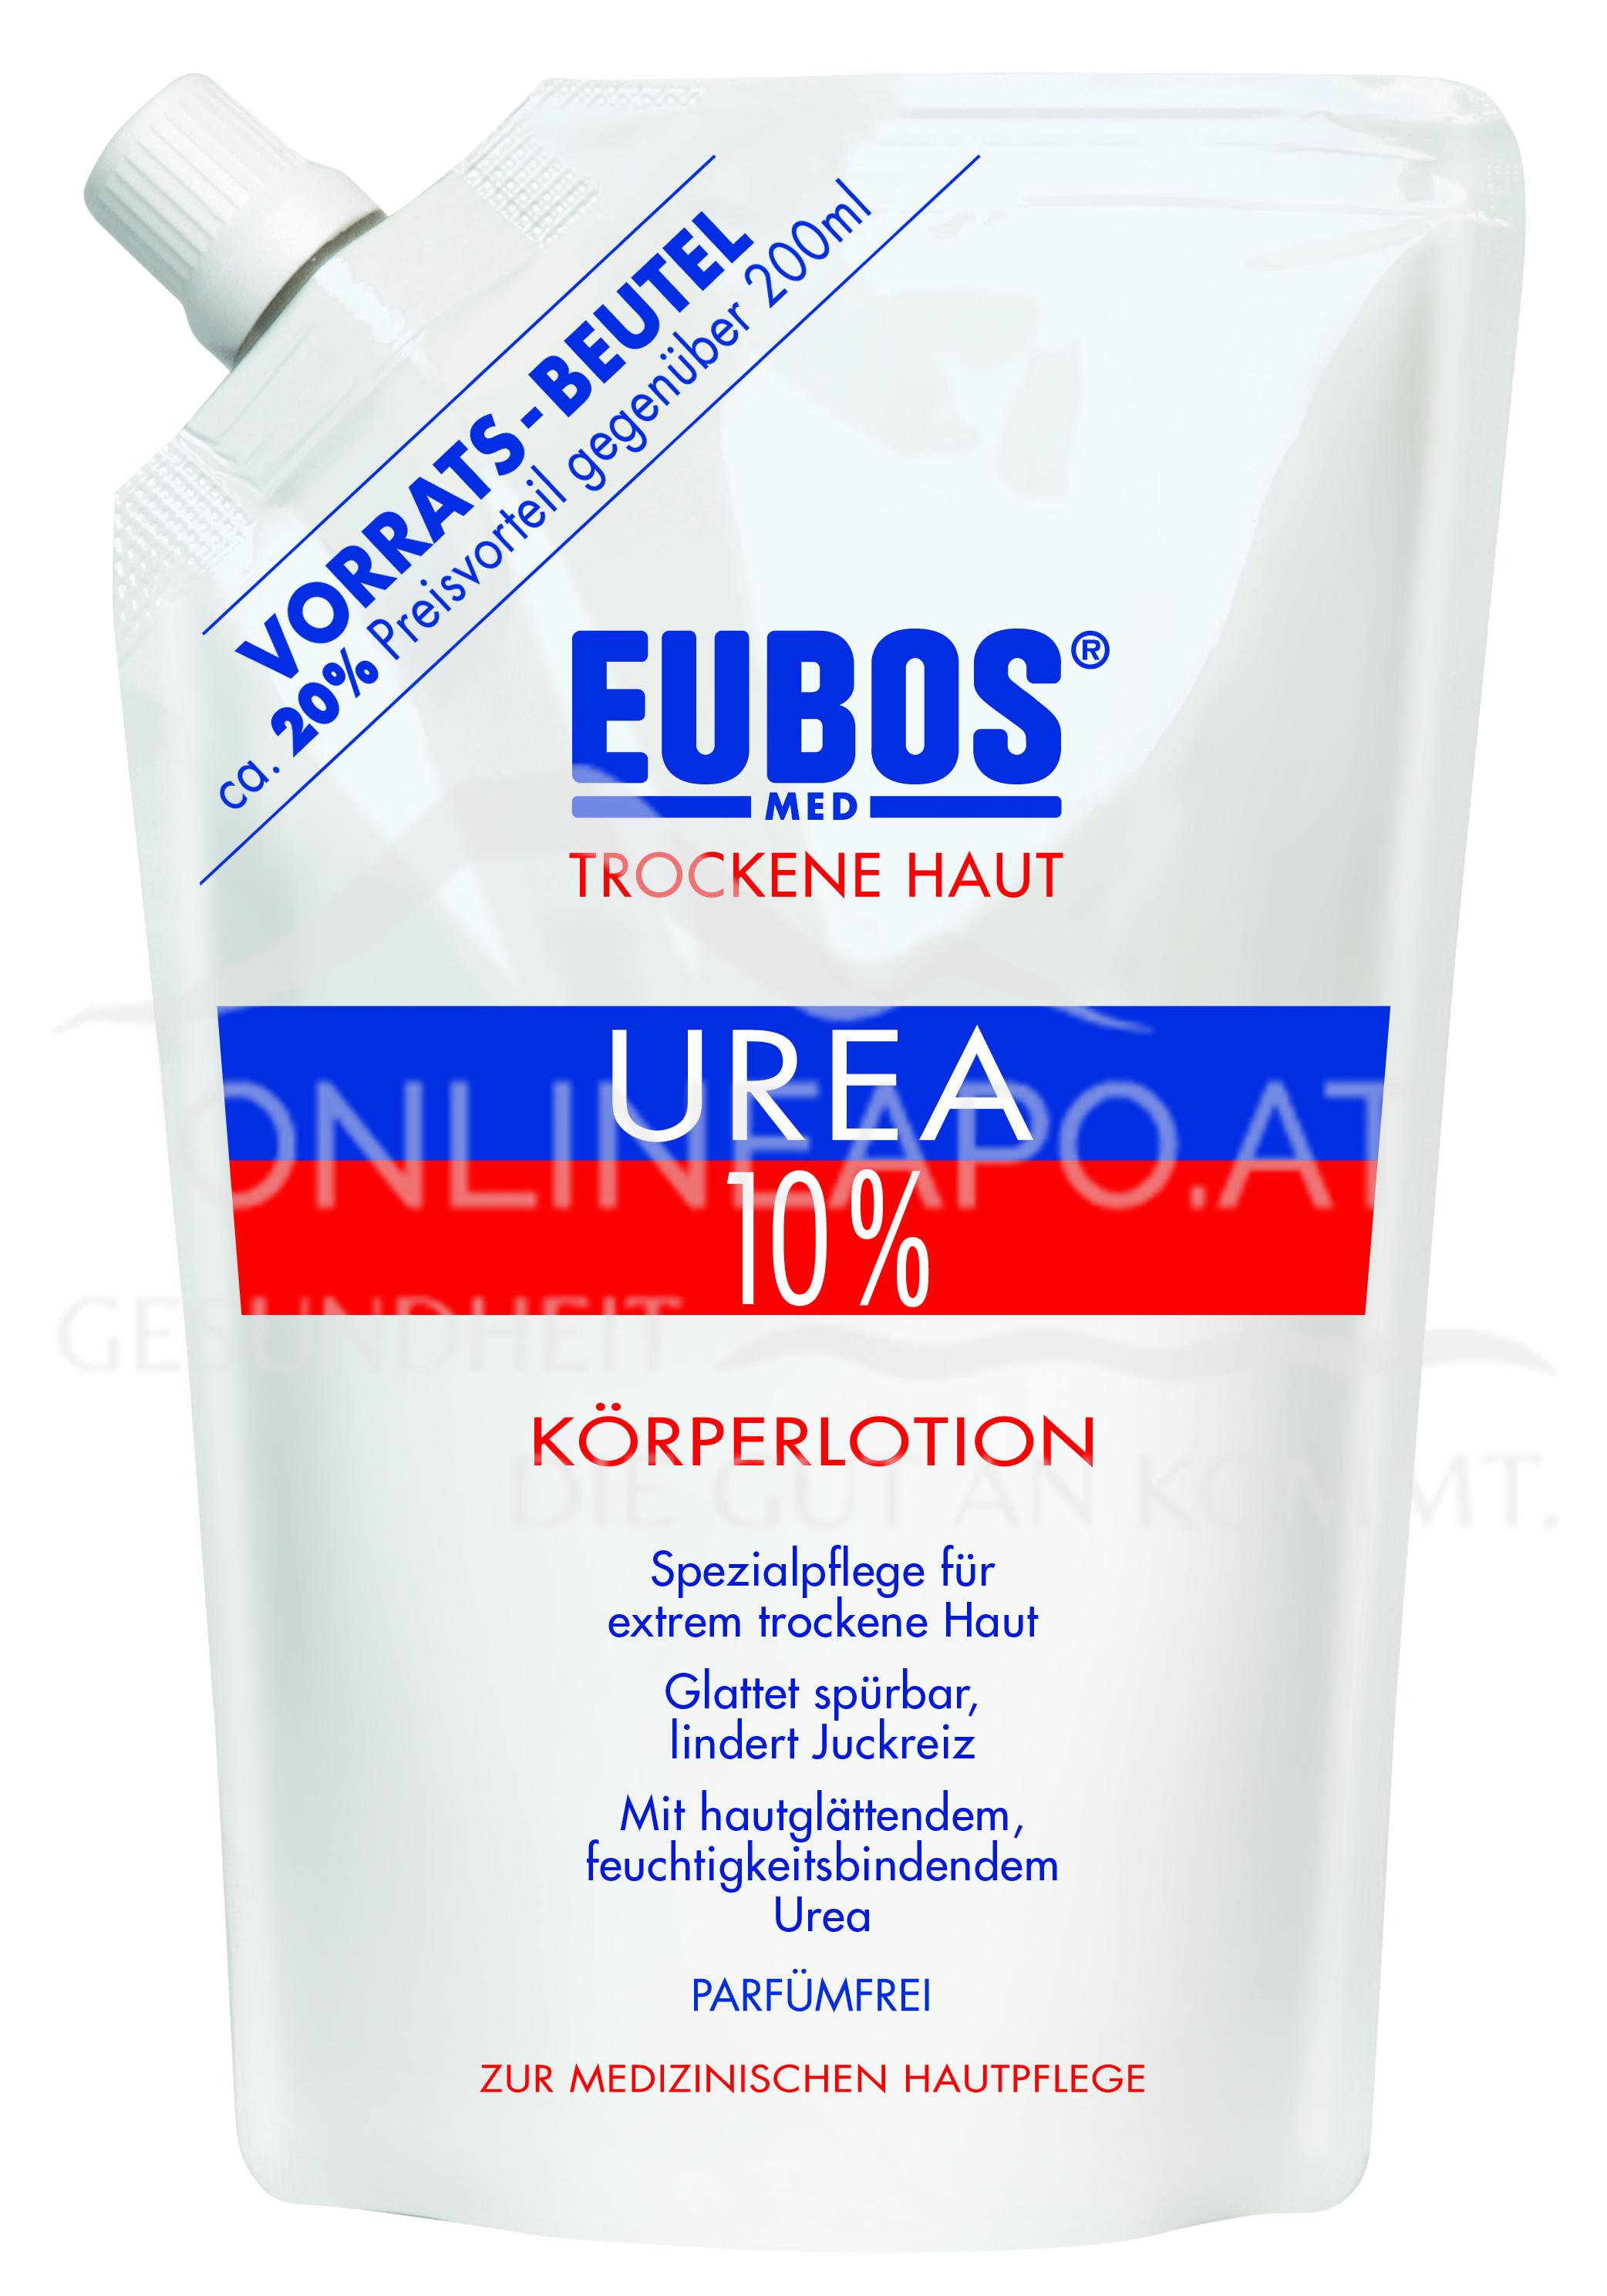 Eubos UREA 10% KÖRPERLOTION